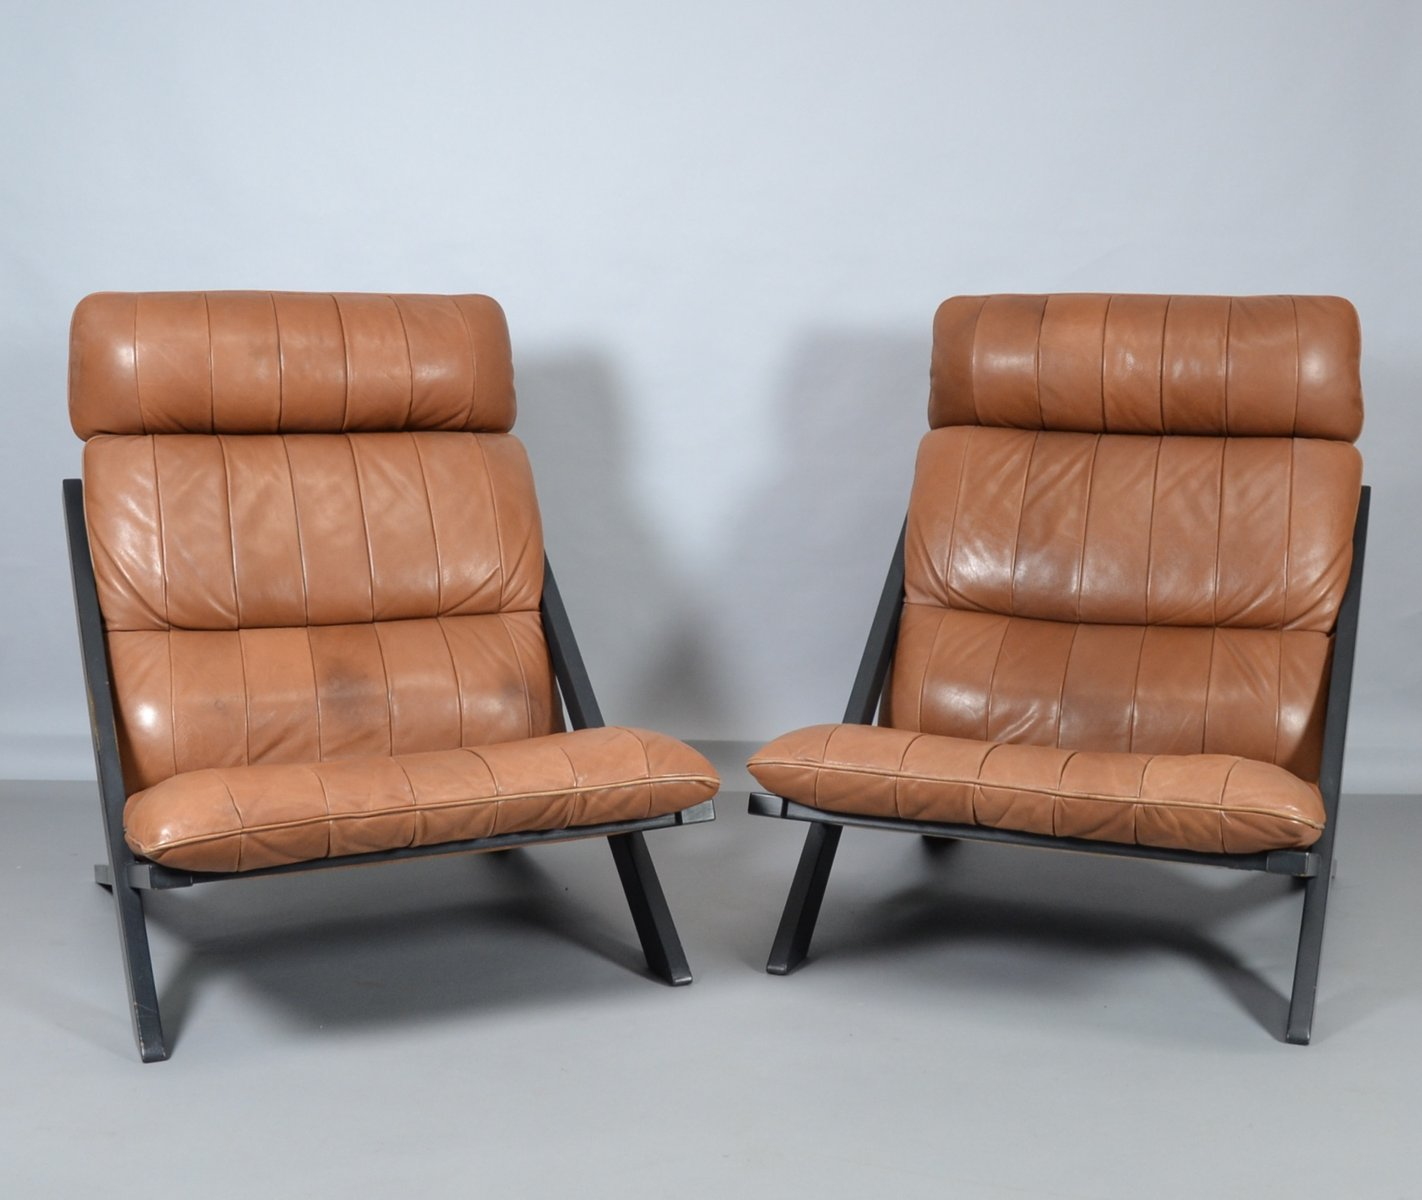 sessel von ueli berger f r de sede 1973 2er set bei pamono kaufen. Black Bedroom Furniture Sets. Home Design Ideas